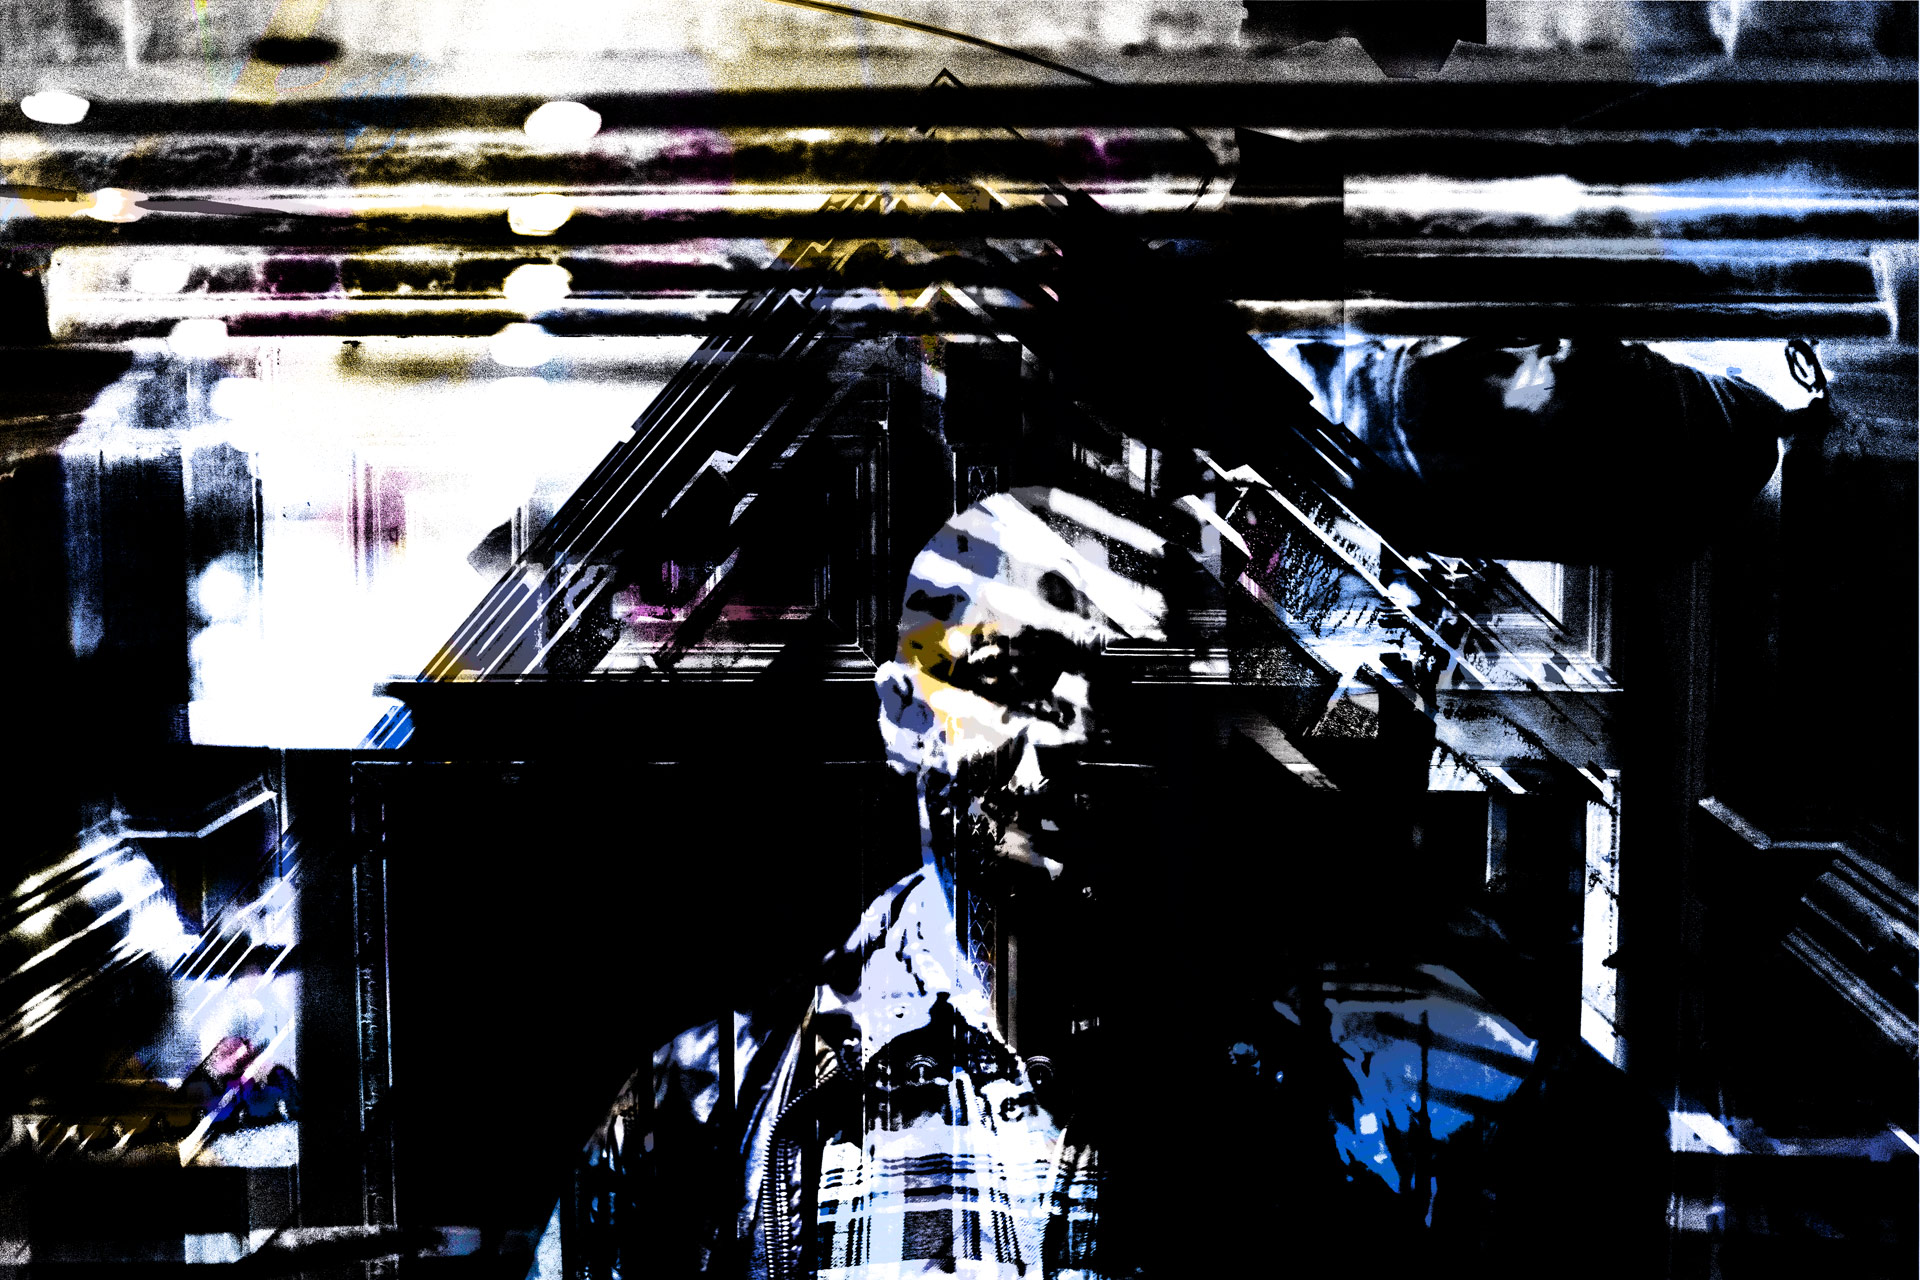 Am-I-Somewhere • 180 x 120 cm (70.86 x 47.24 in)